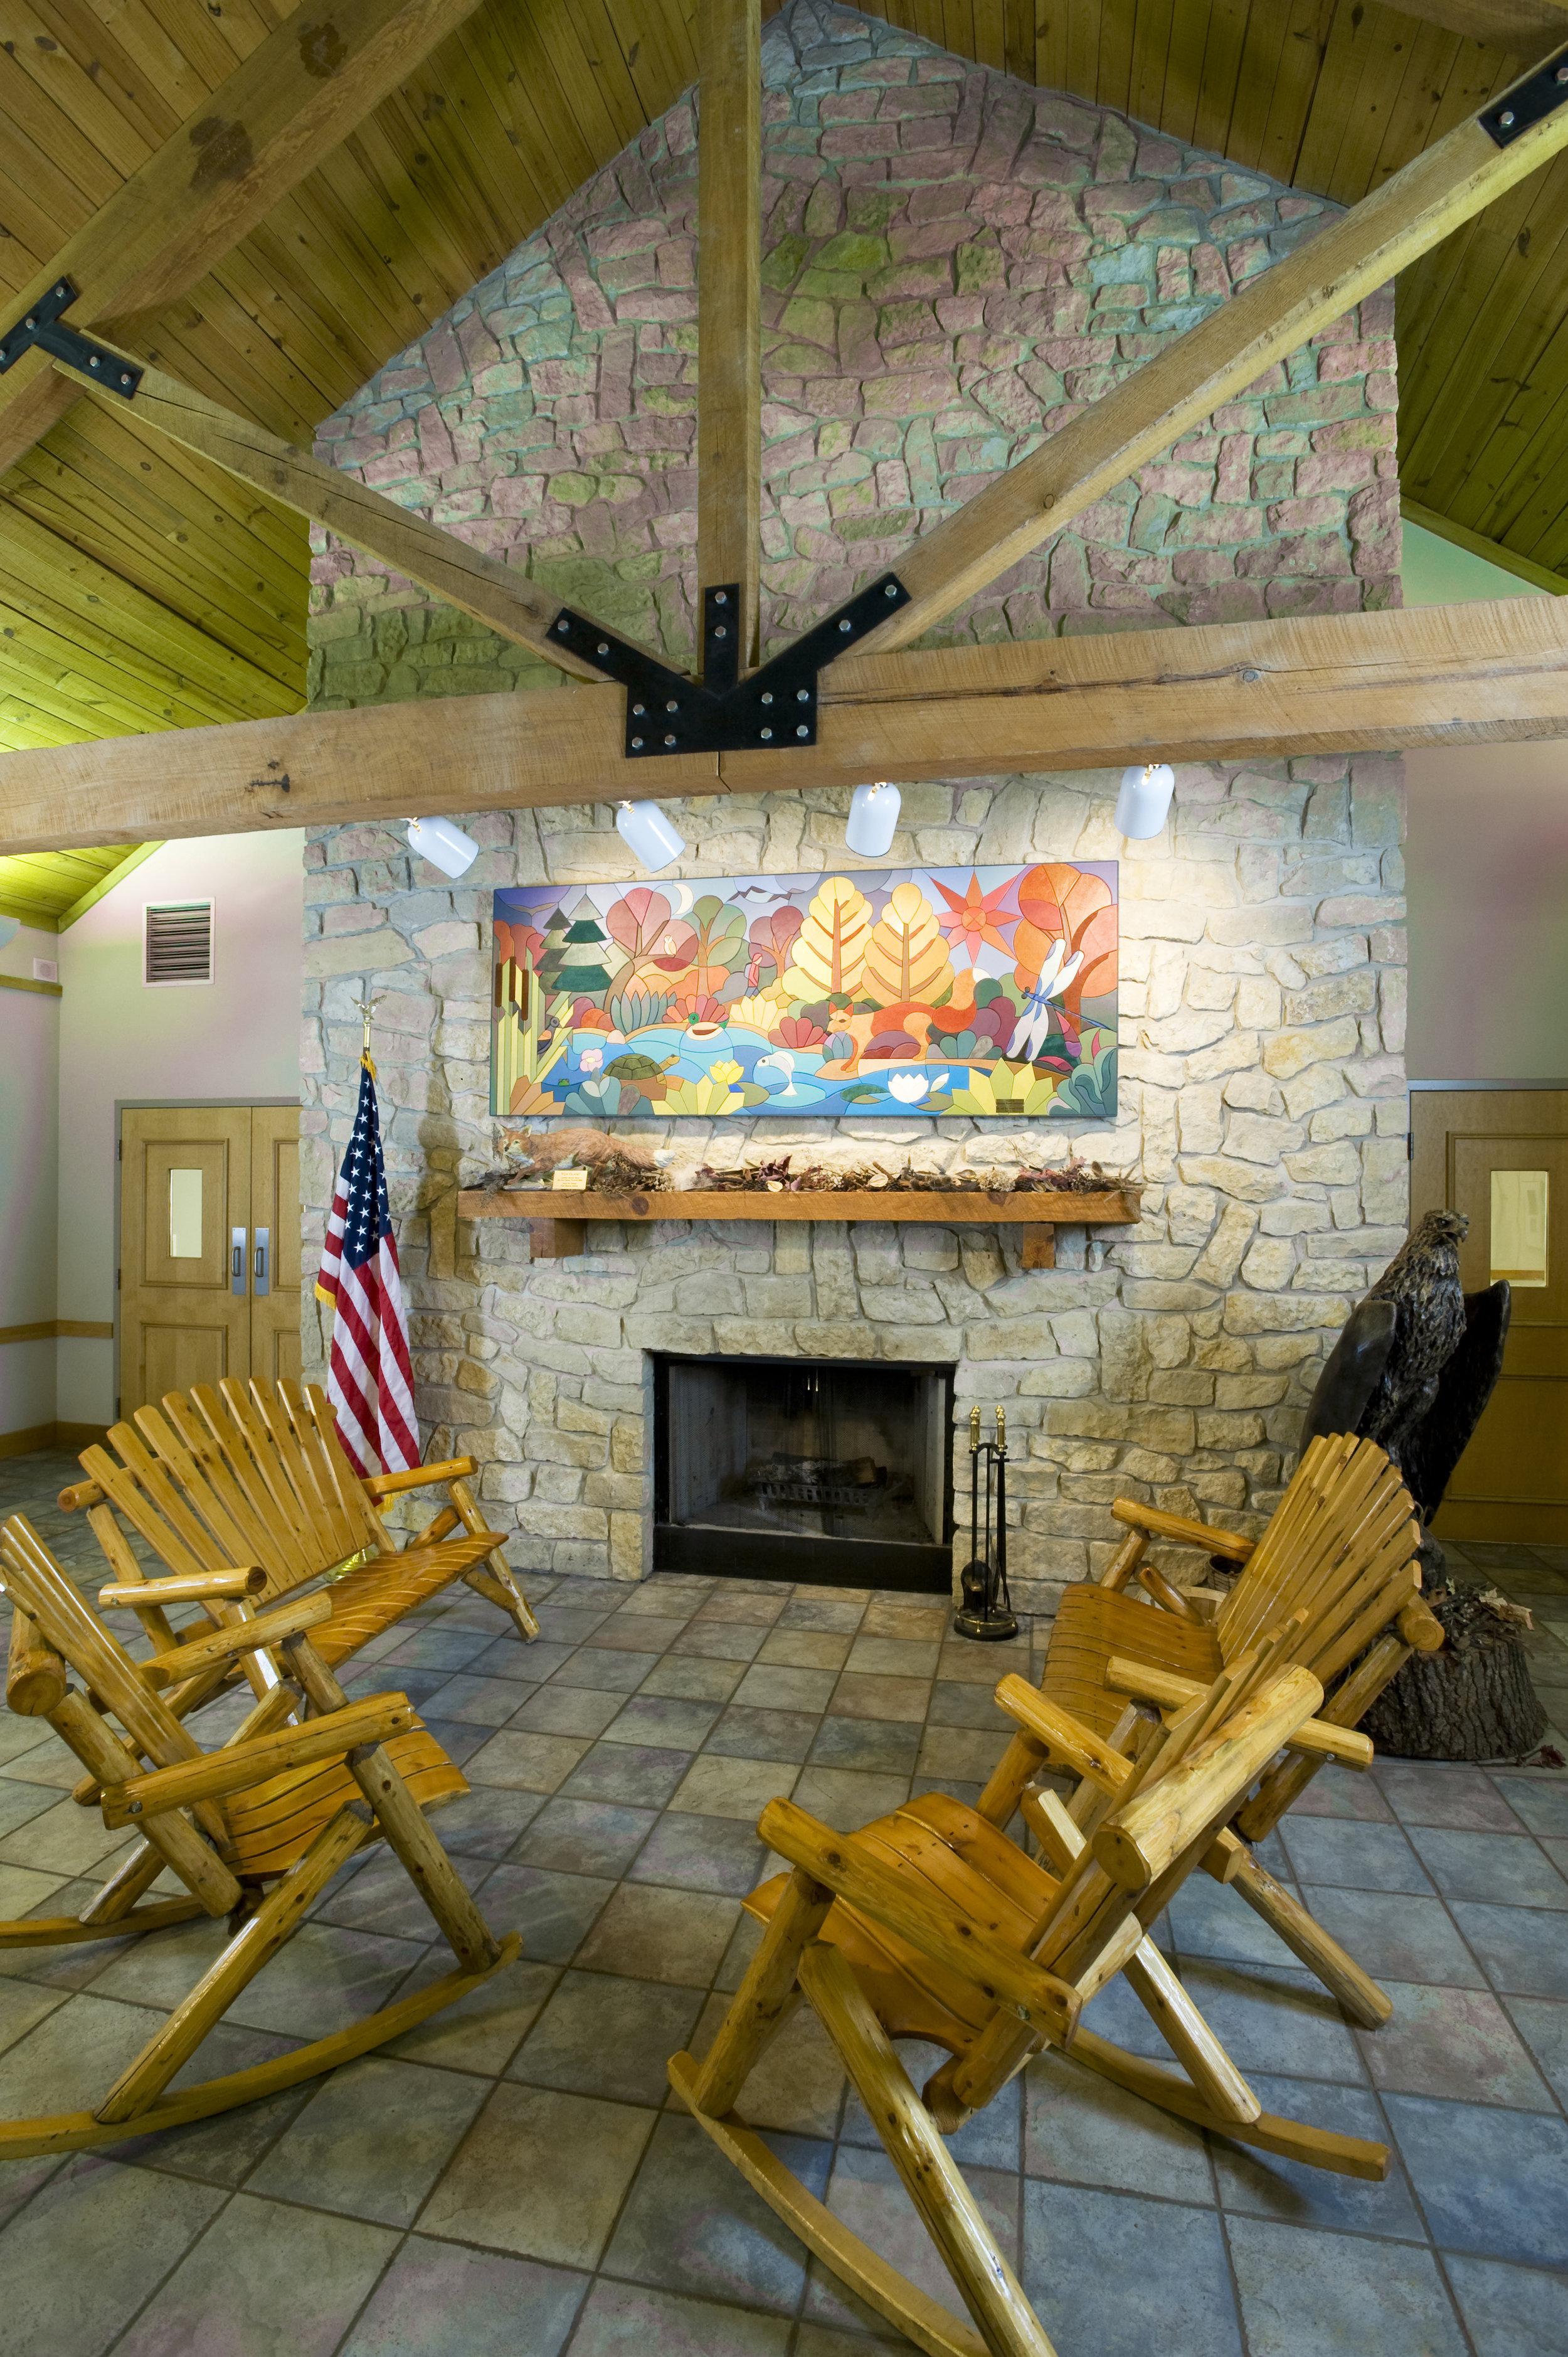 Fox Island Interior Fire Place  003.jpg